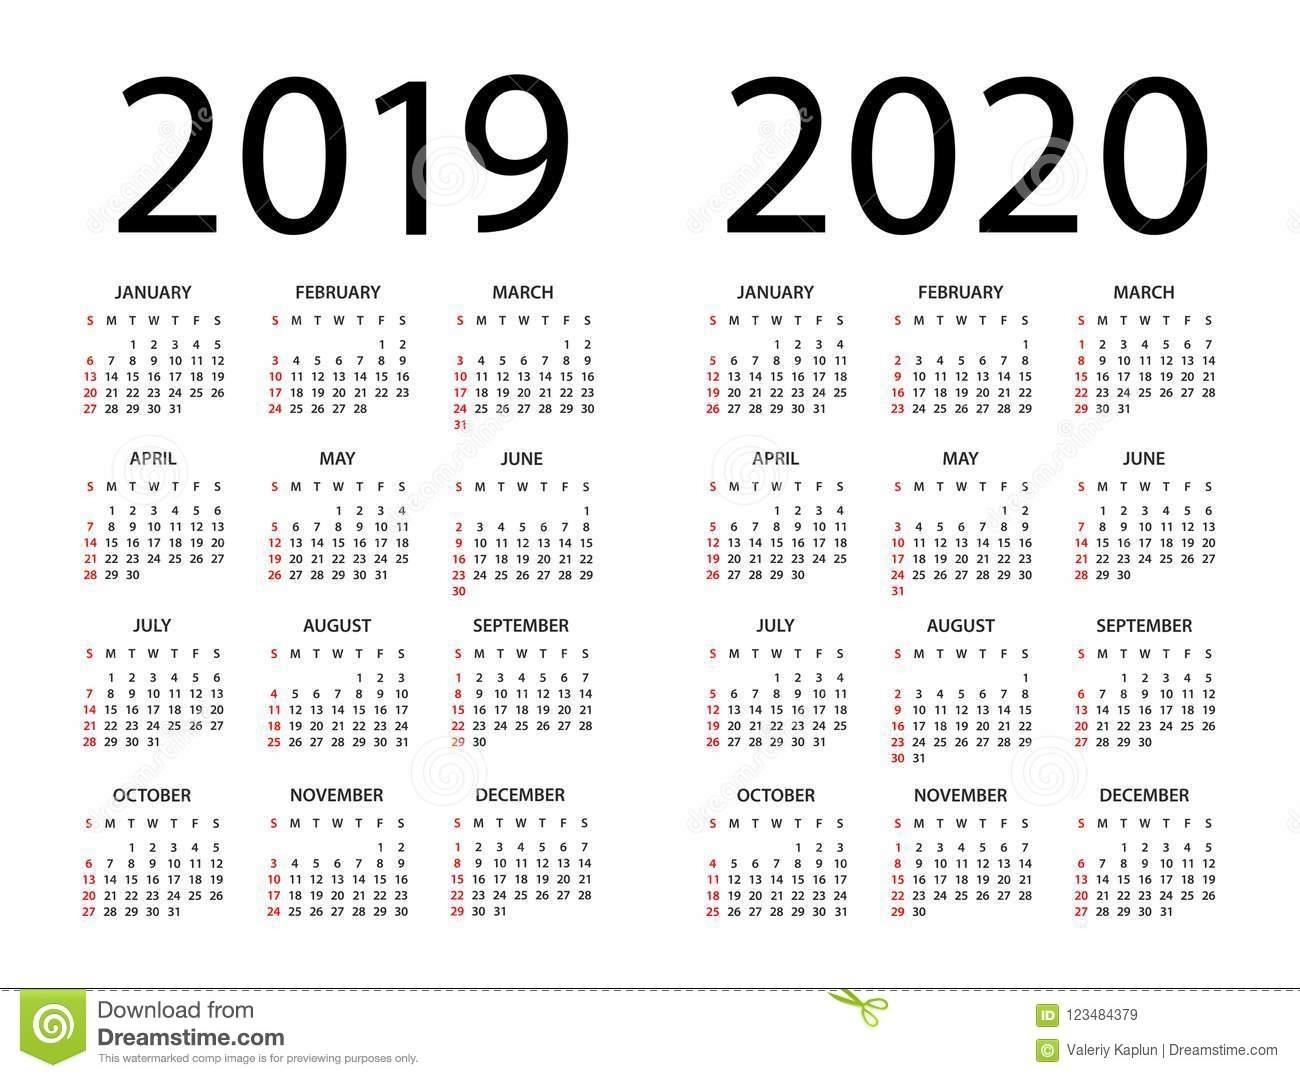 Calendar 2019 2020 - Illustration. Week Starts On Sunday Stock for Monday - Sunday 2020